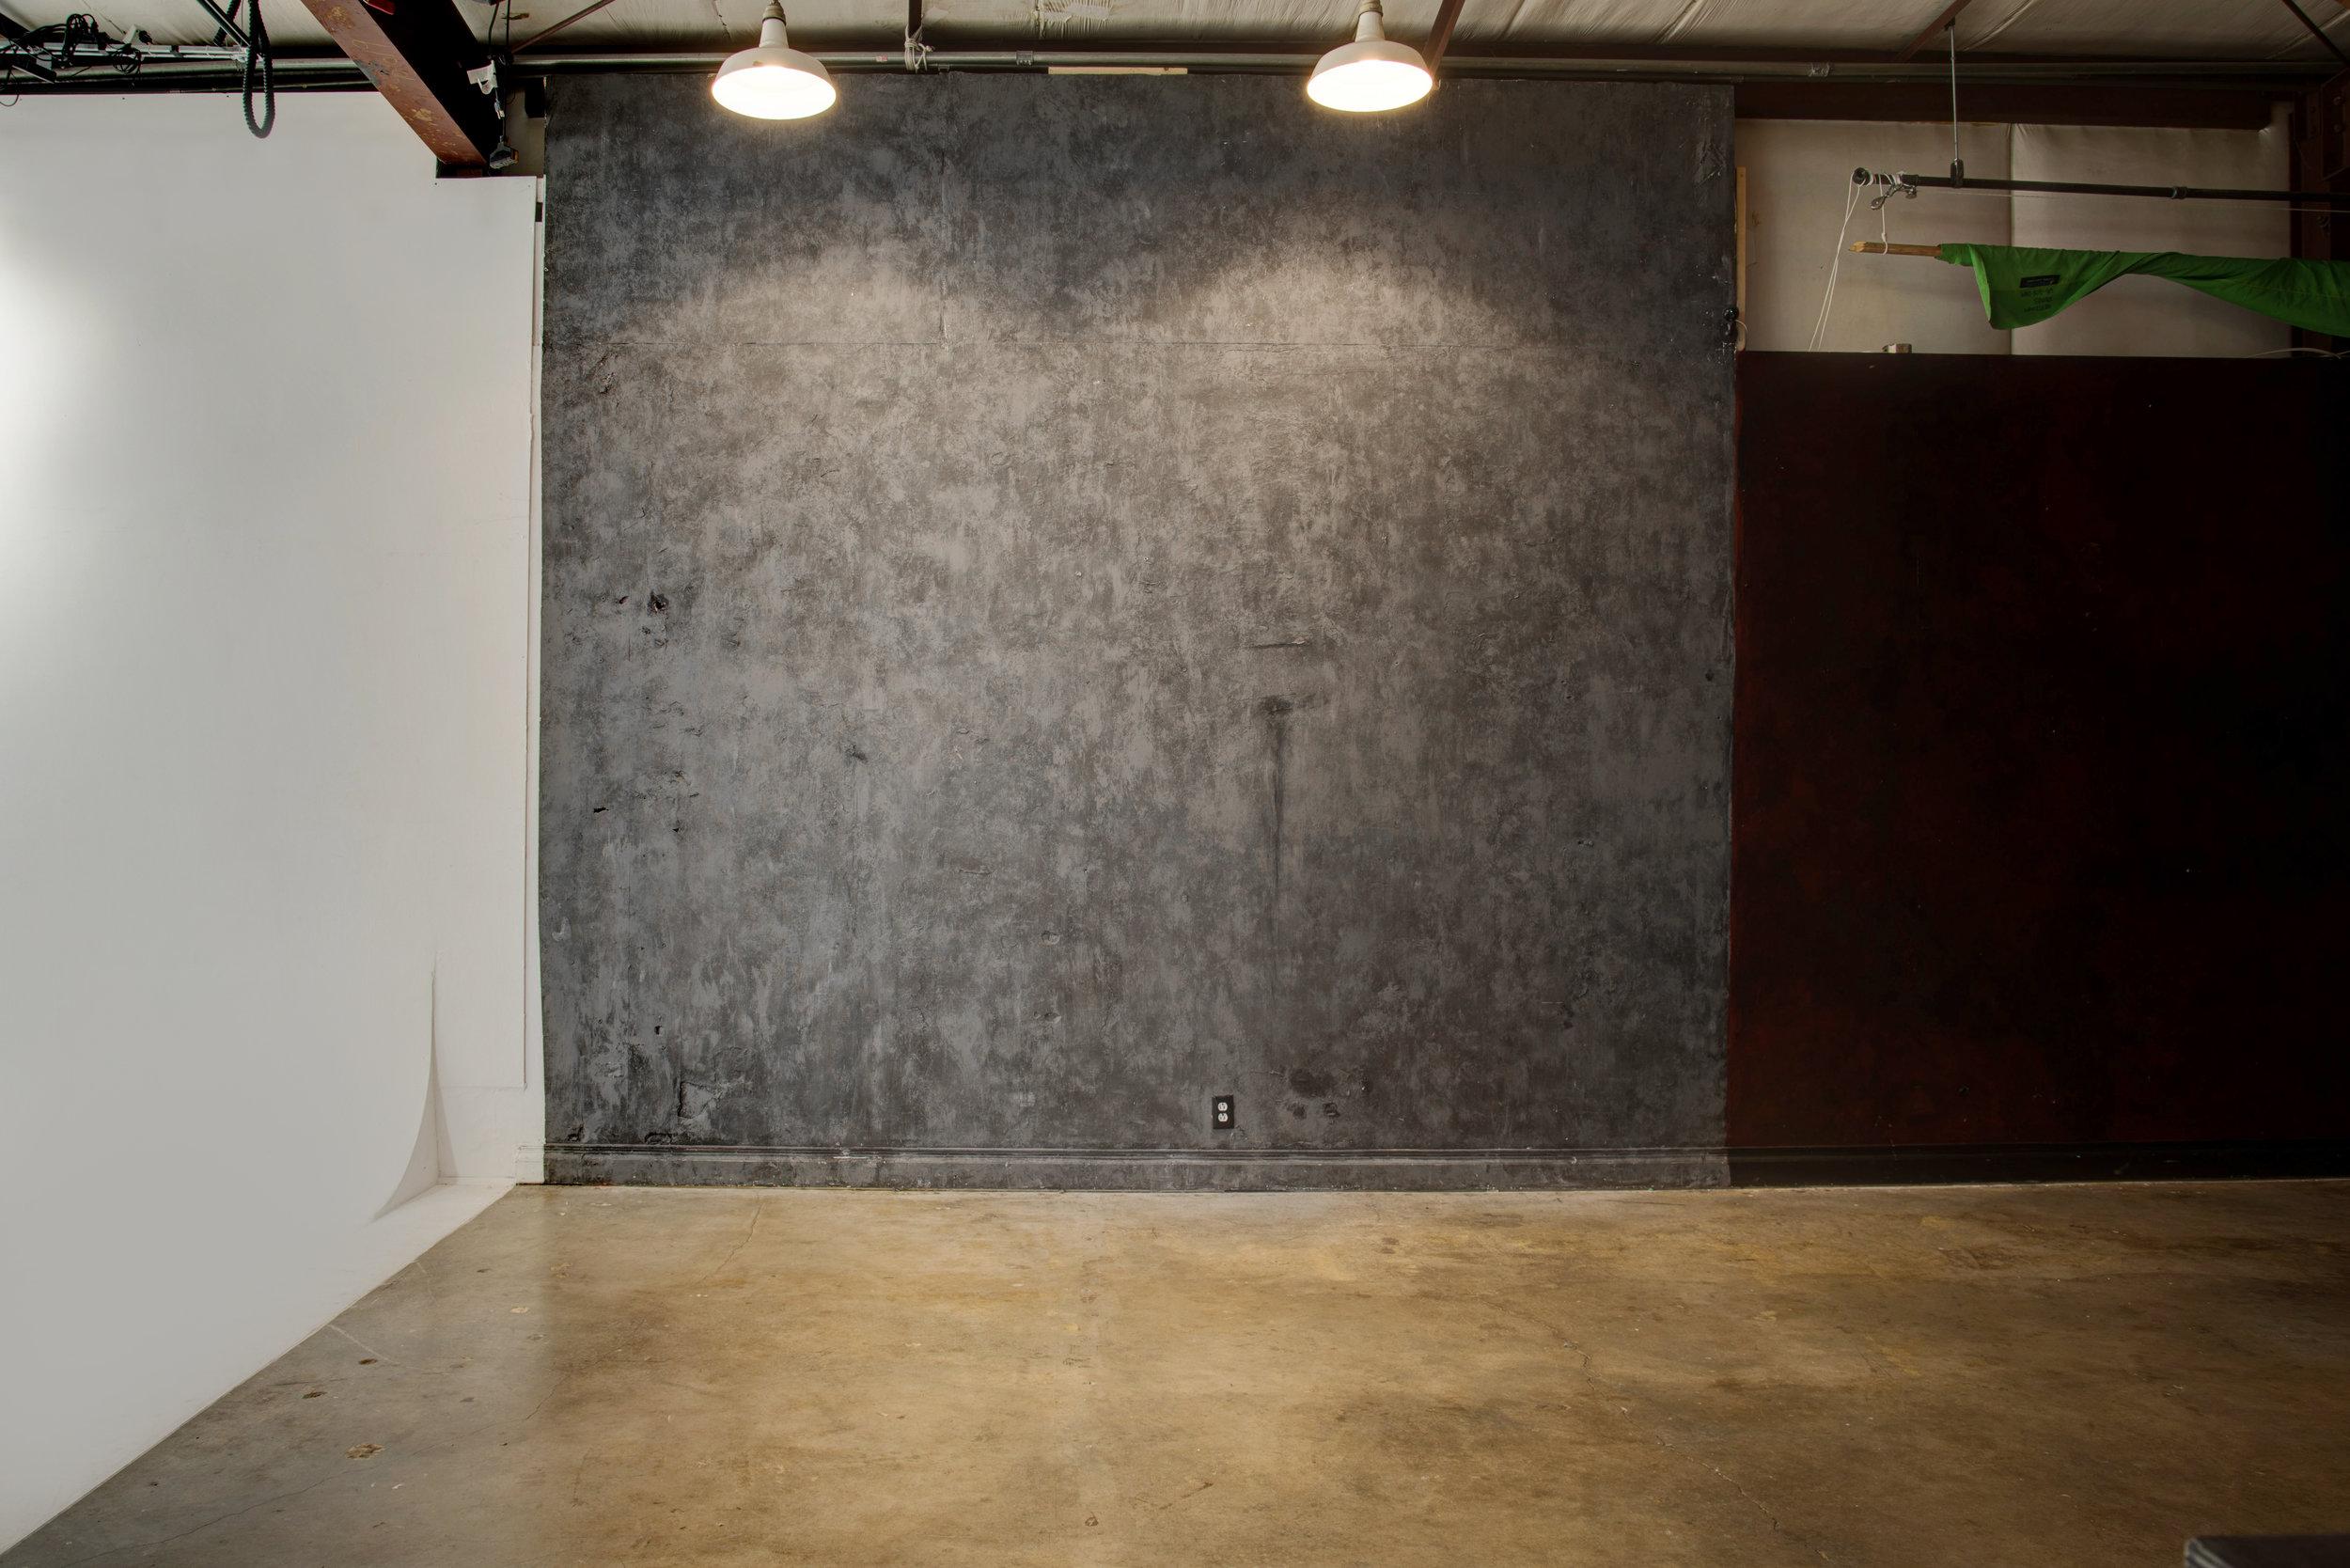 East Studio Gray wall texture.jpg